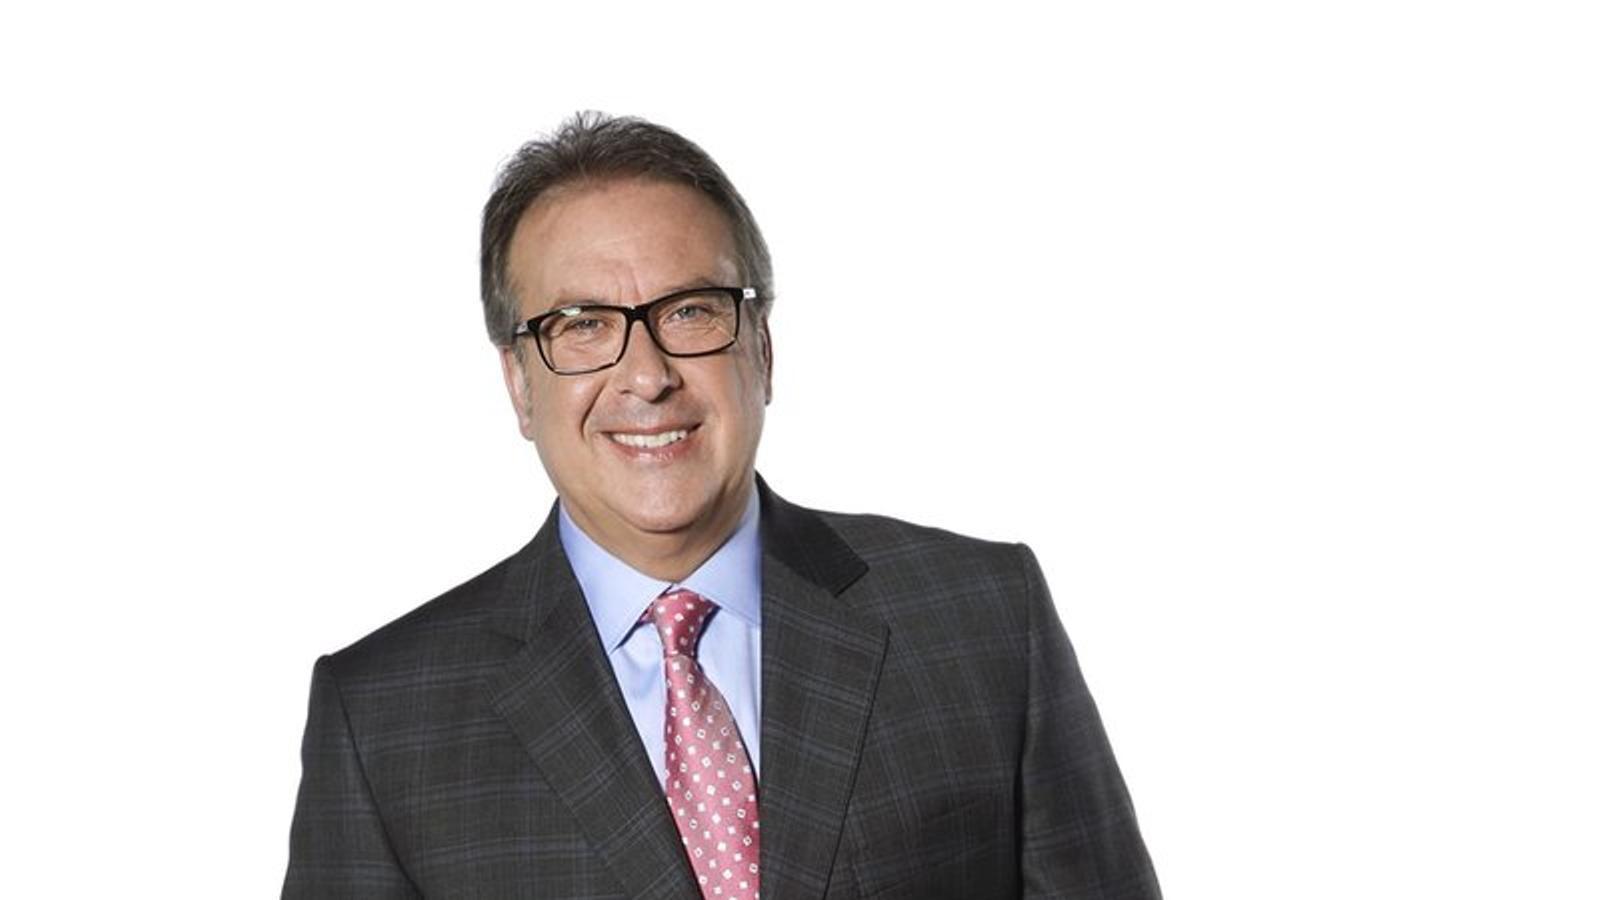 El periodista Josep Cuní, presentador de '8 al dia' a la cadena 8tv